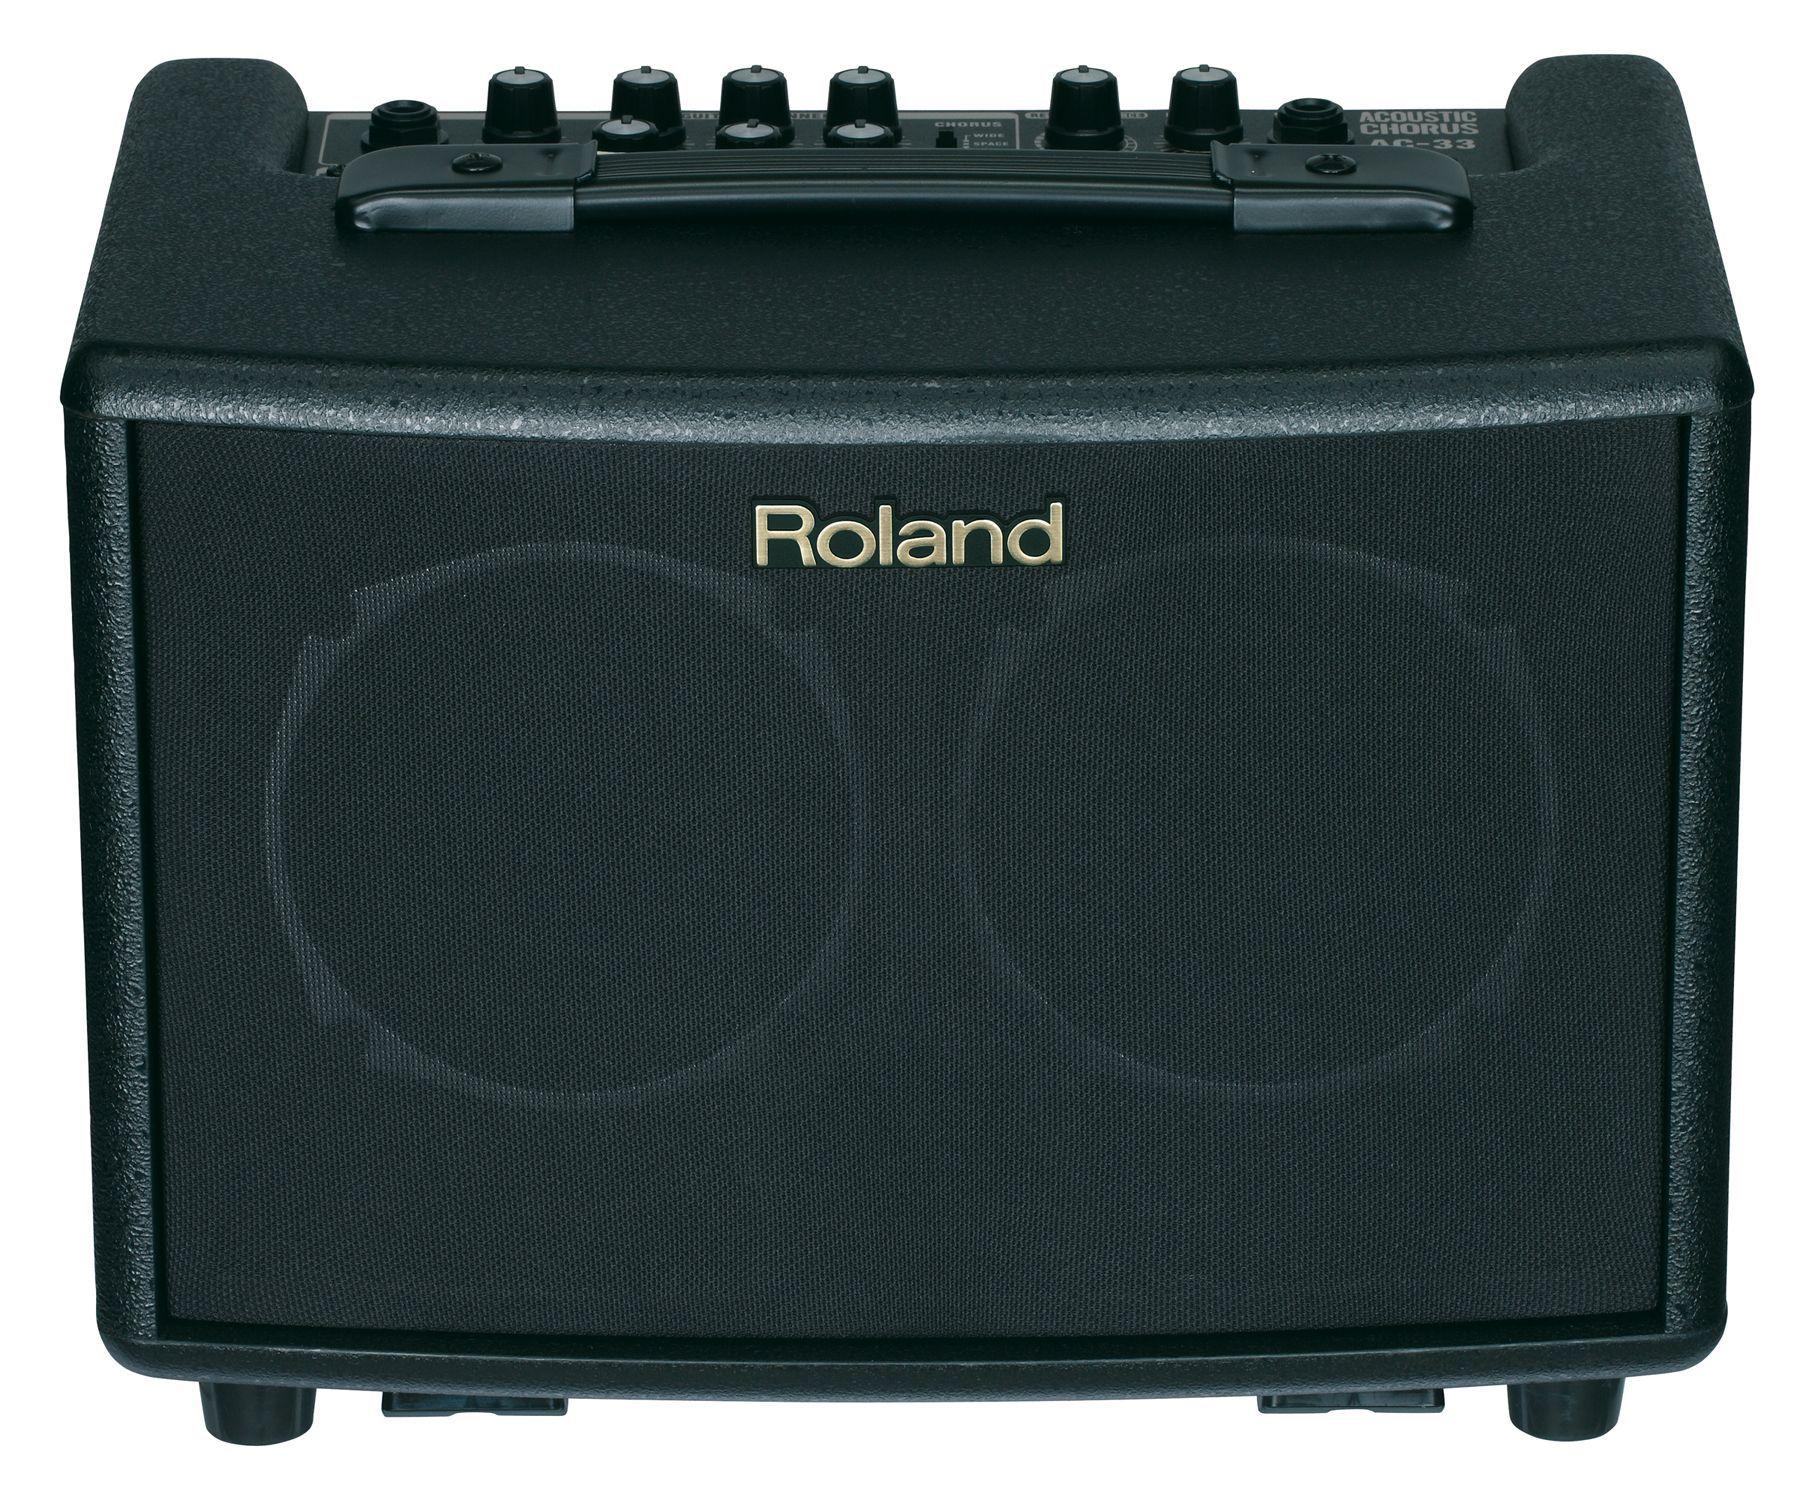 Roland AC-33 Akustik Verstärker